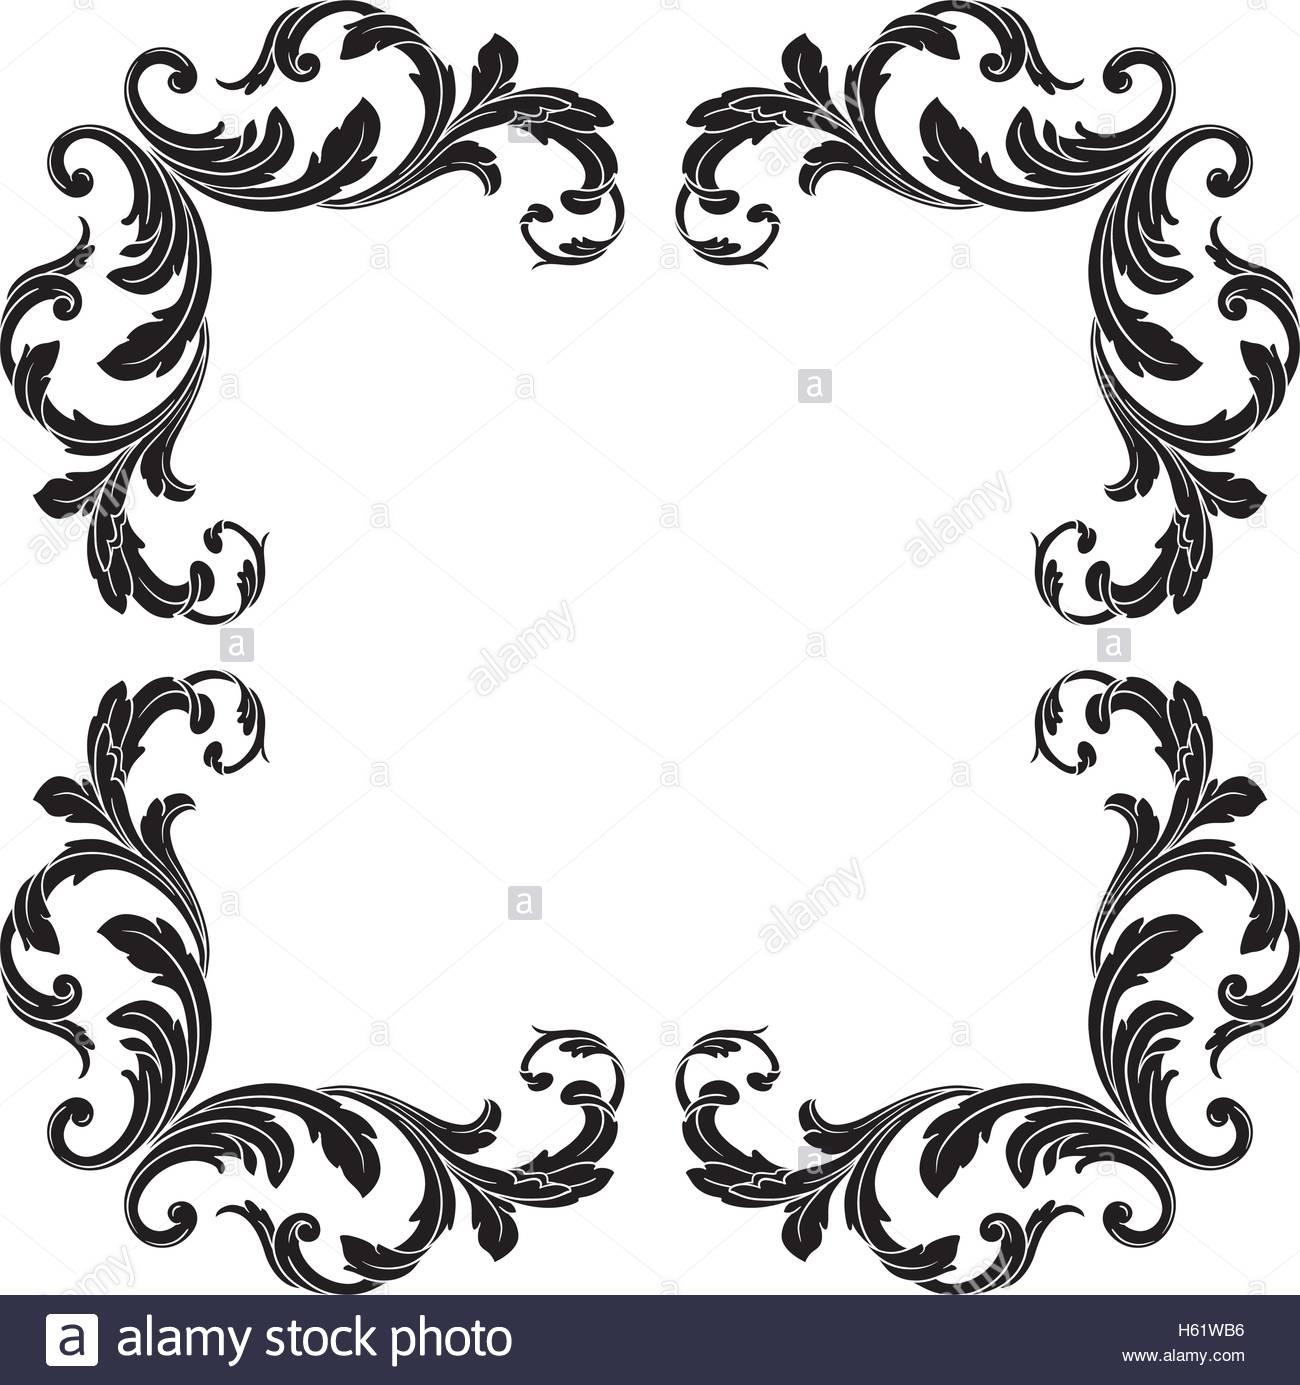 1300x1385 Engraving Clipart Border